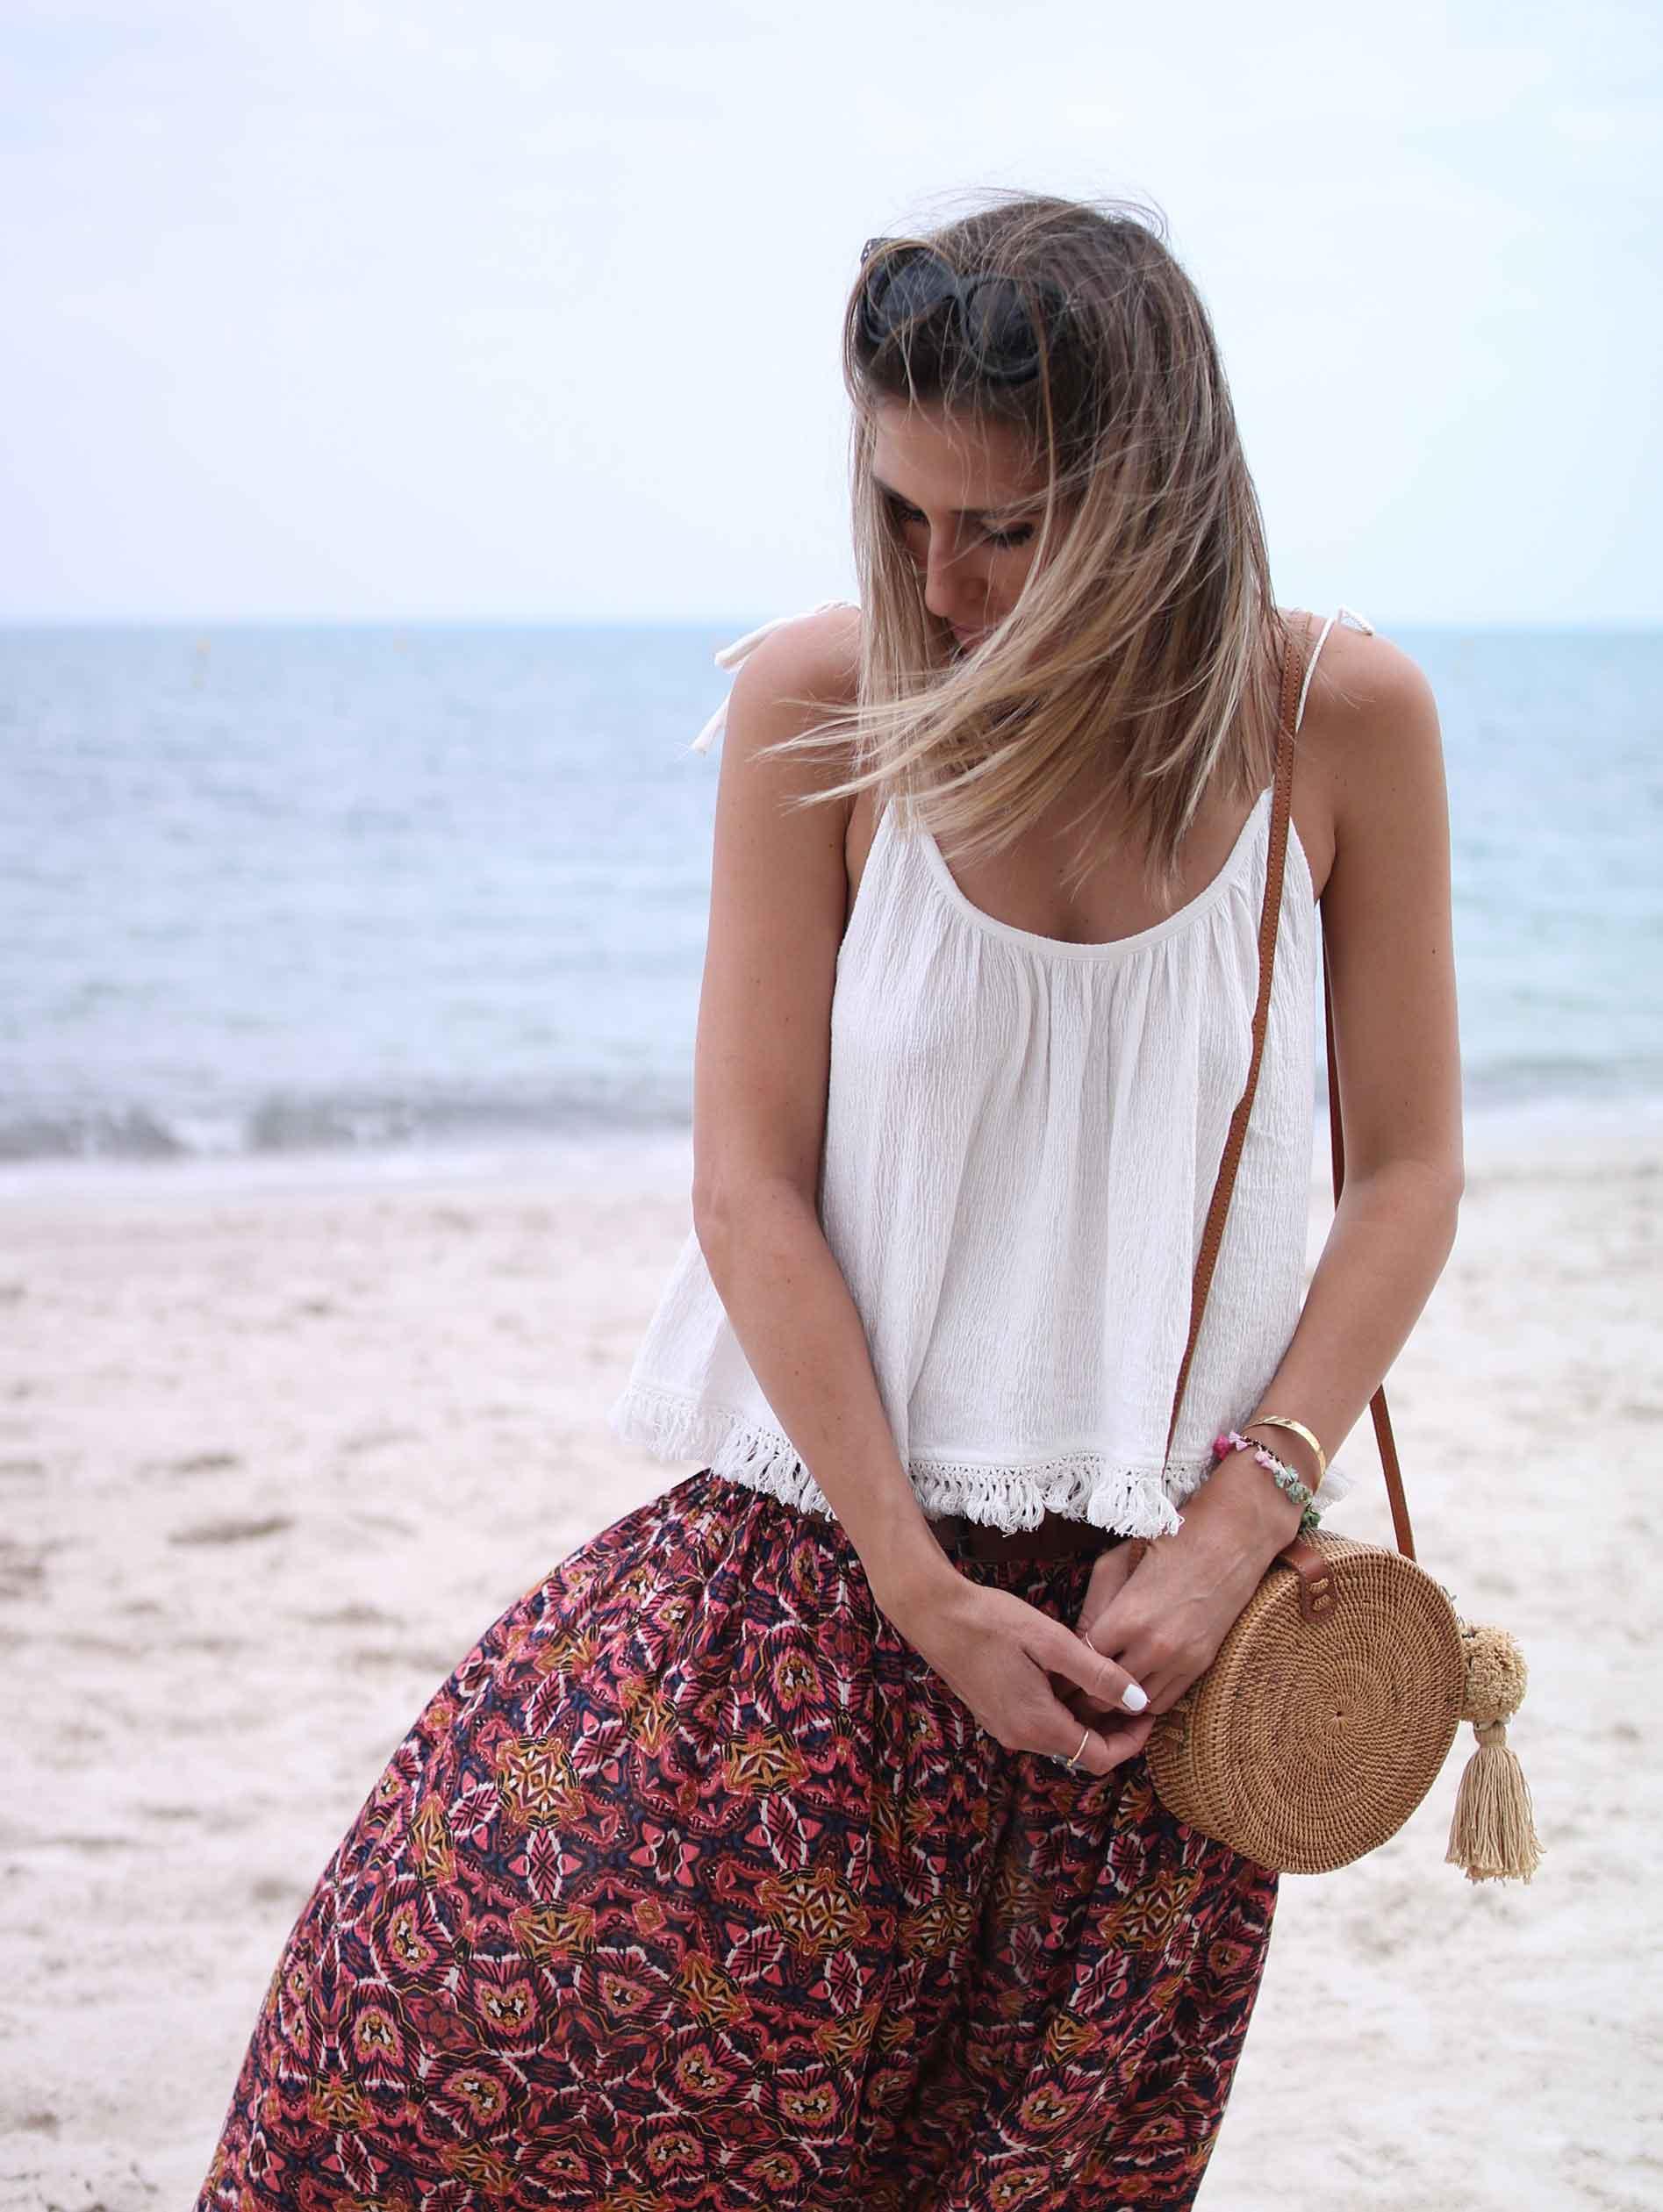 bali bag round bag pepyth maxi skirt bohem billabong